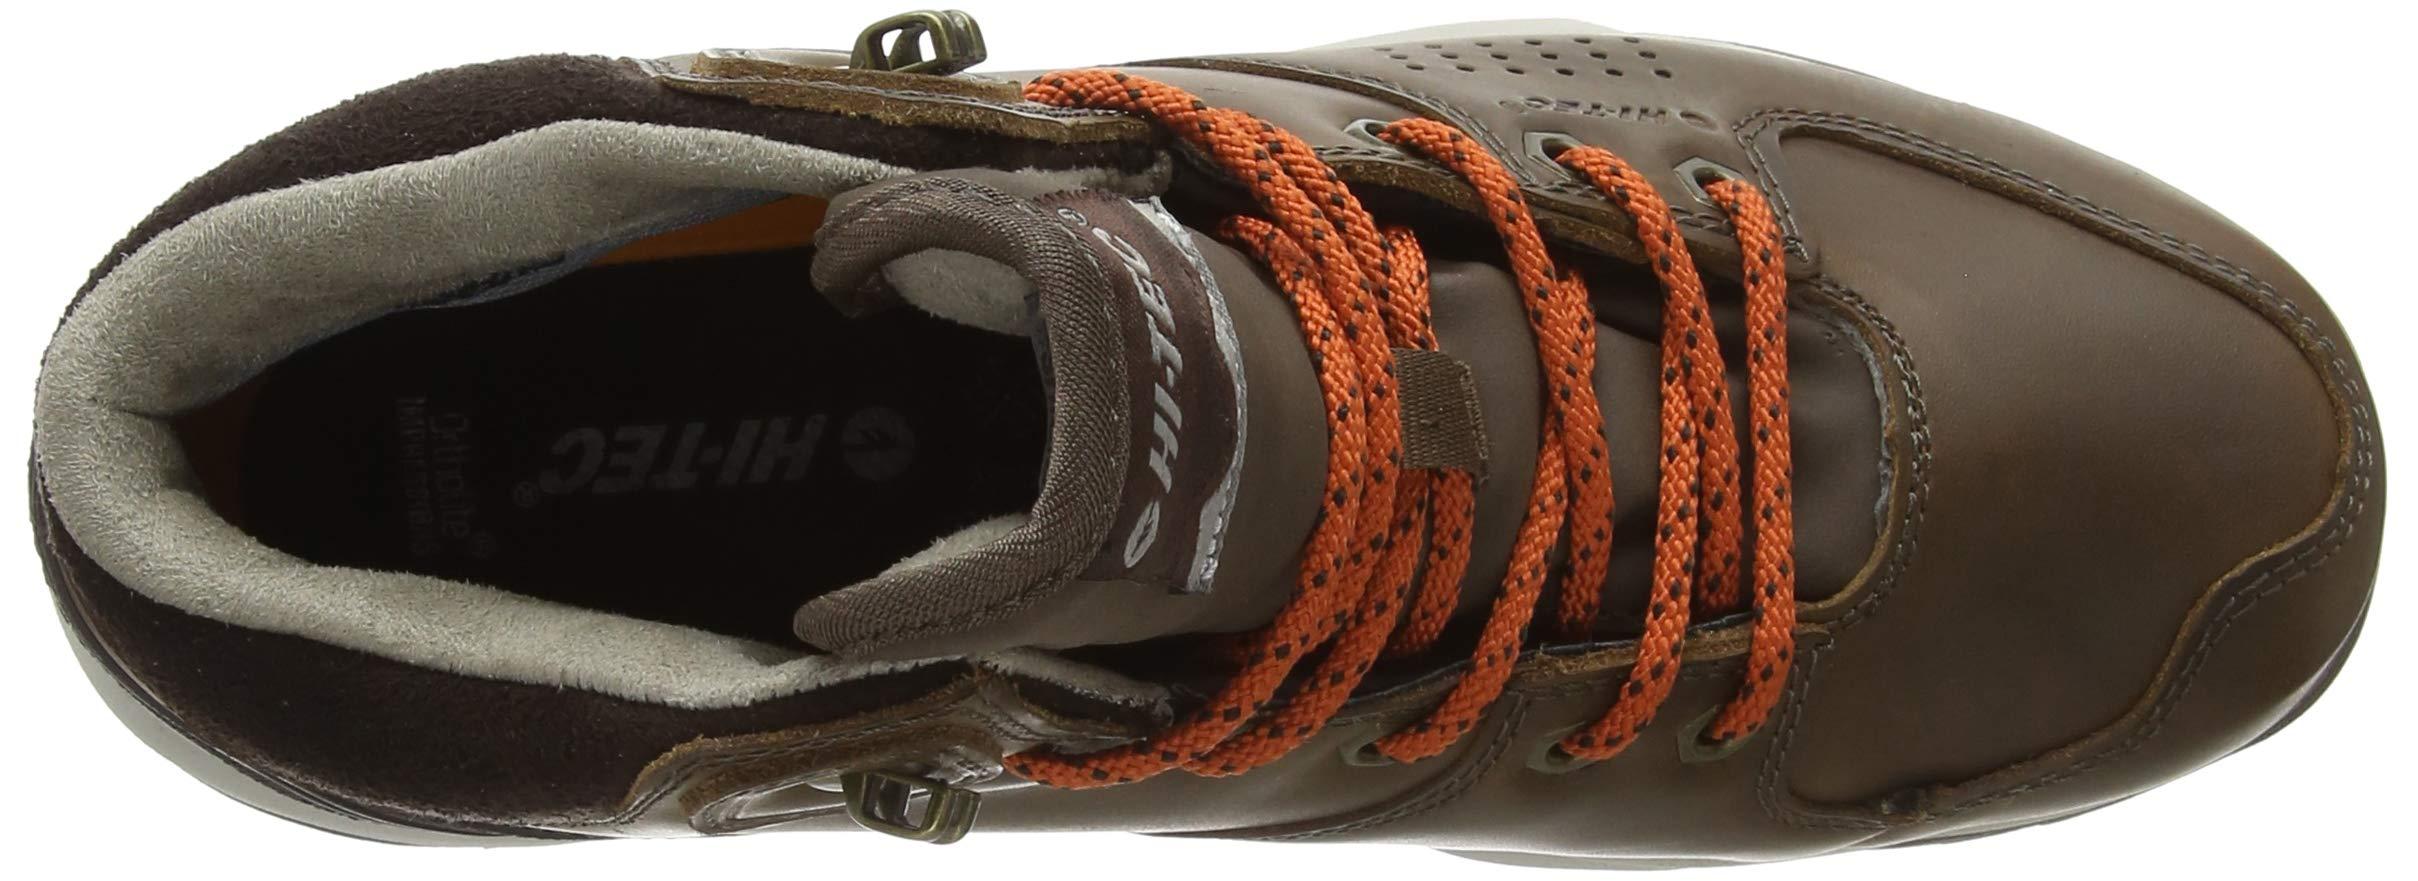 Hi-Tec Women's Wild-Life Luxe I Waterproof High Rise Hiking Boots 7